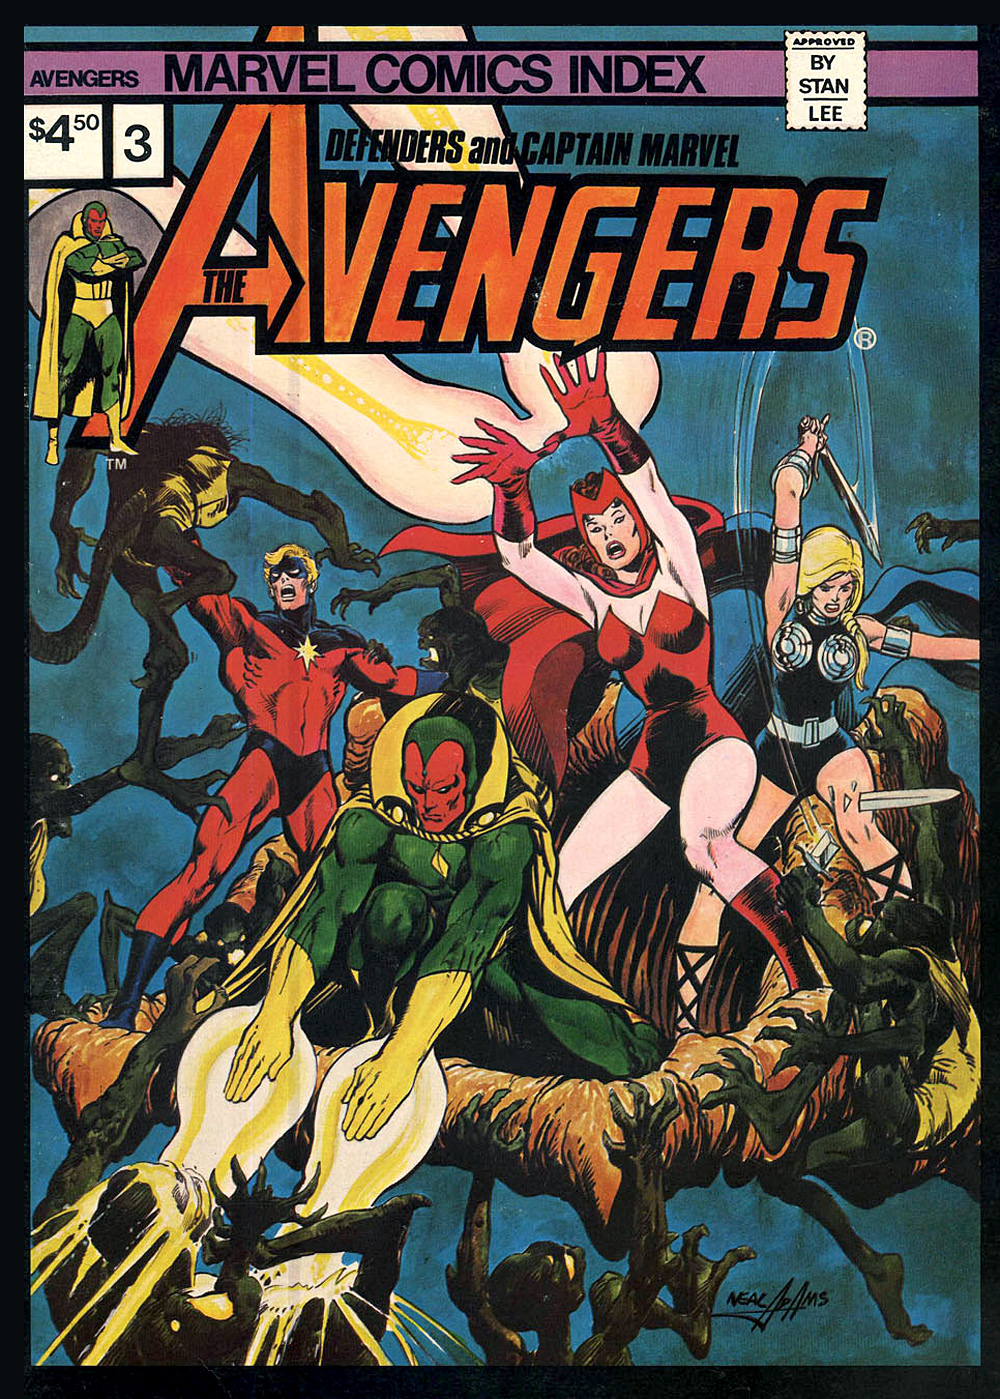 Marvel Comics Index, vols 1, 2, 3 and 4 (1976-77) | 'TAIN'T